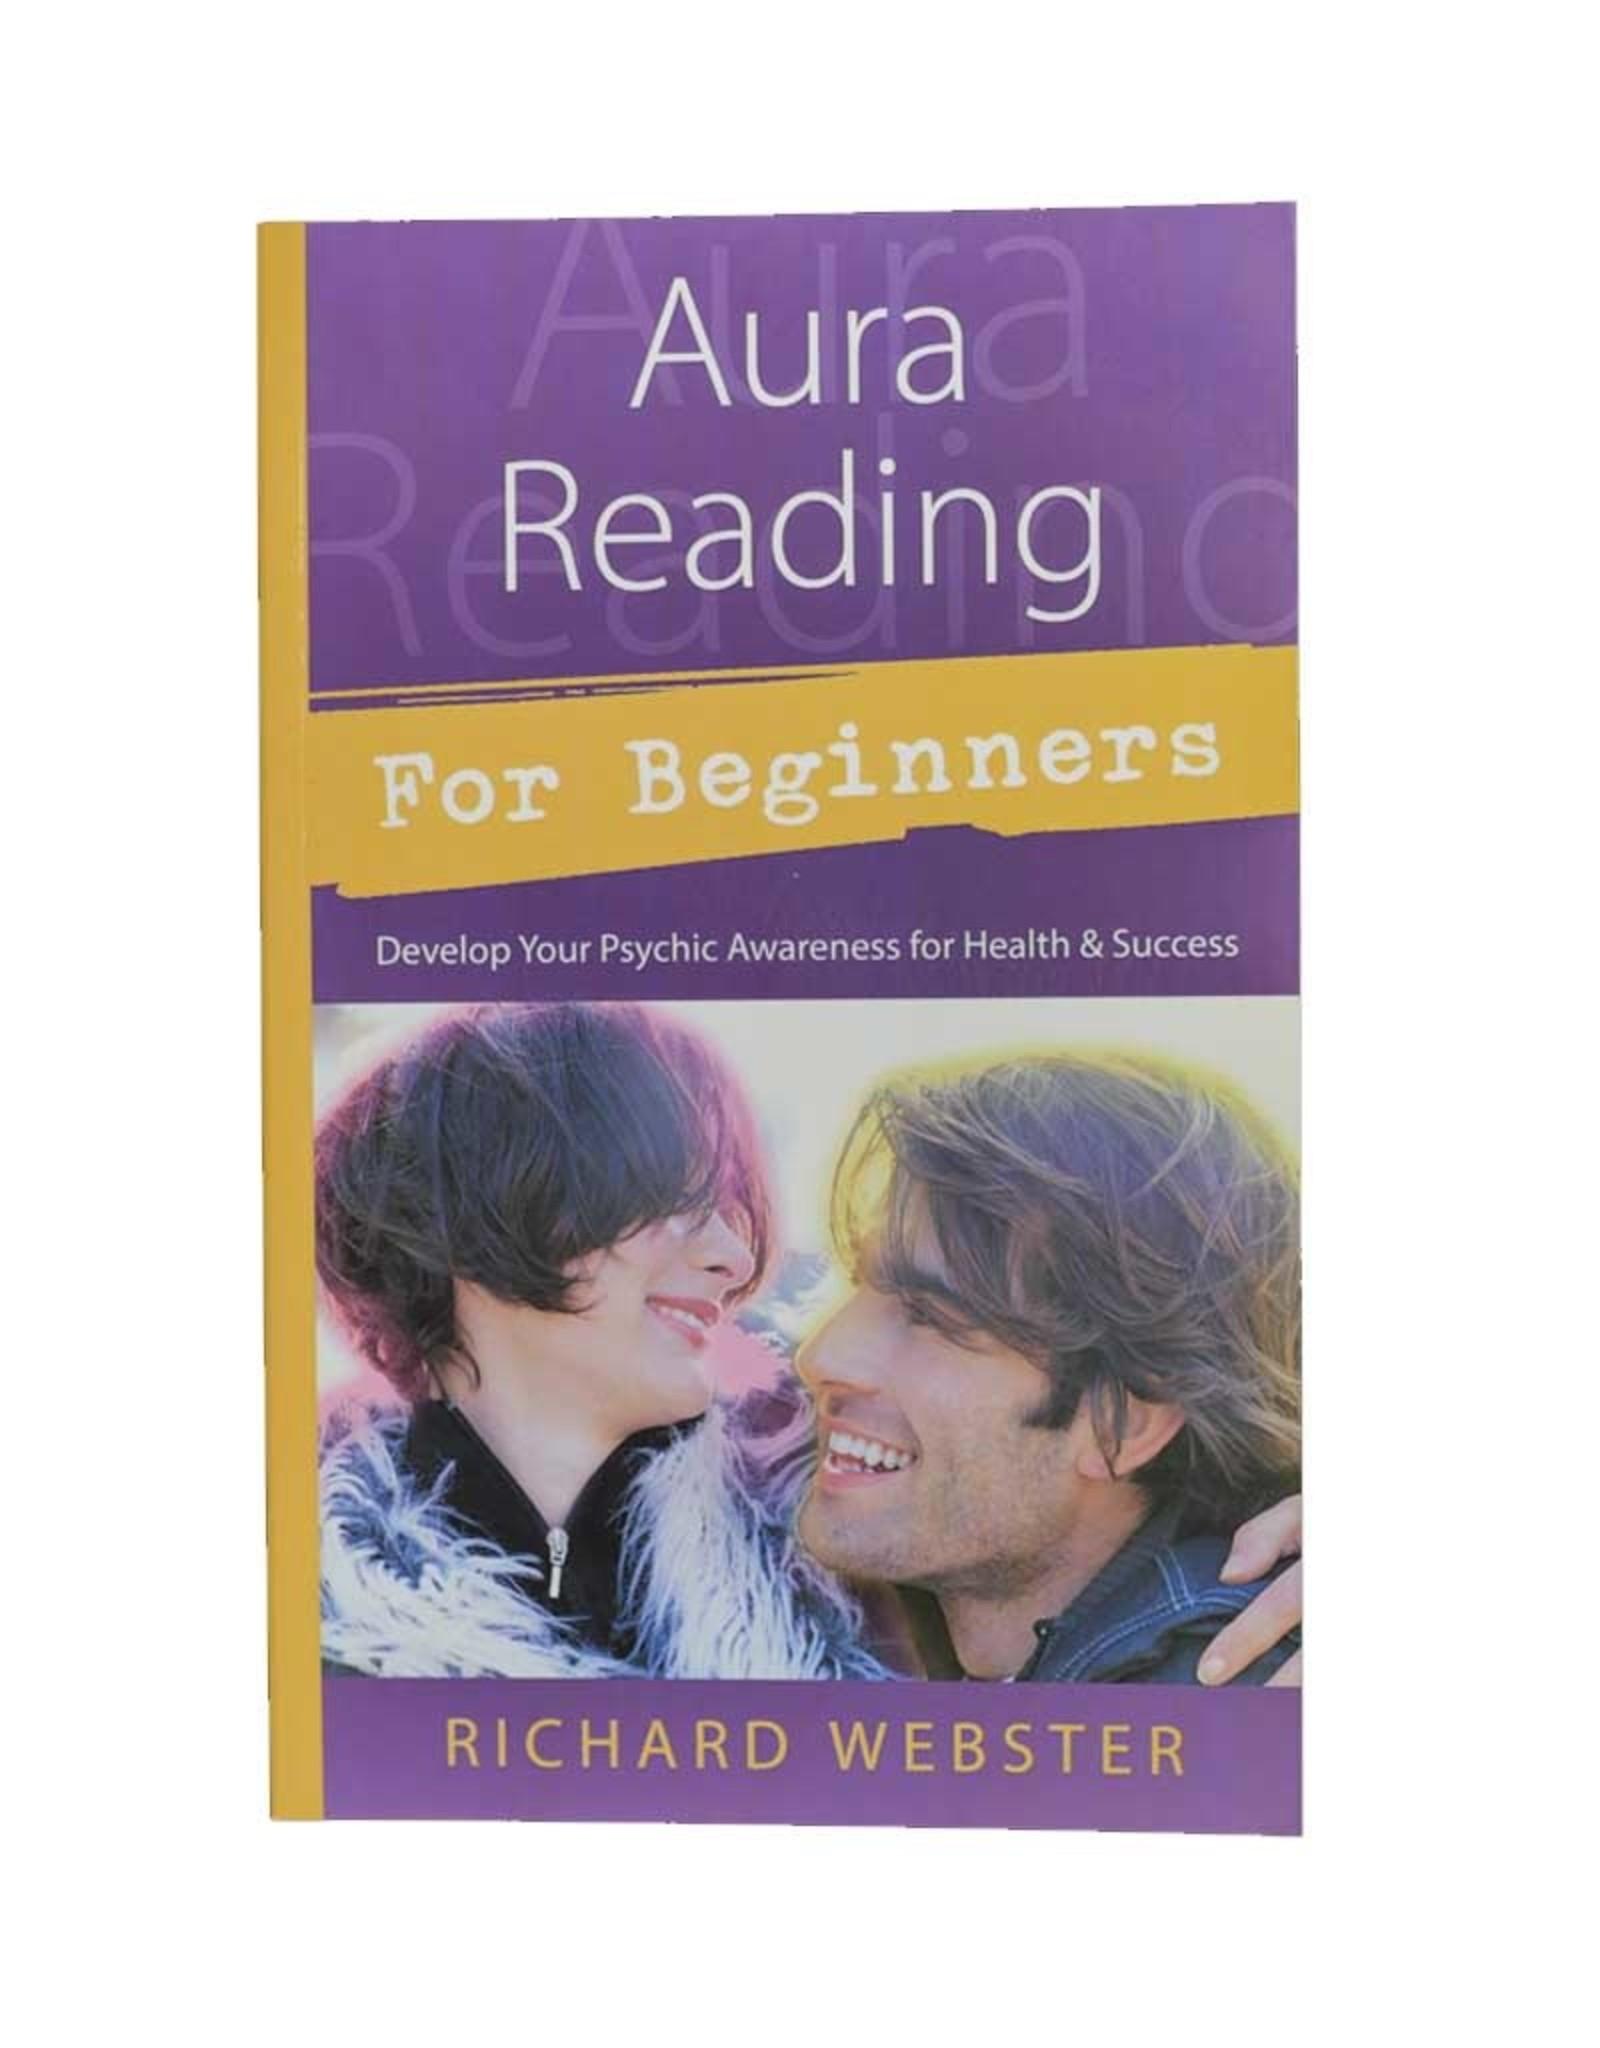 Richard Webster Aura Reading for Beginners by Richard Webster